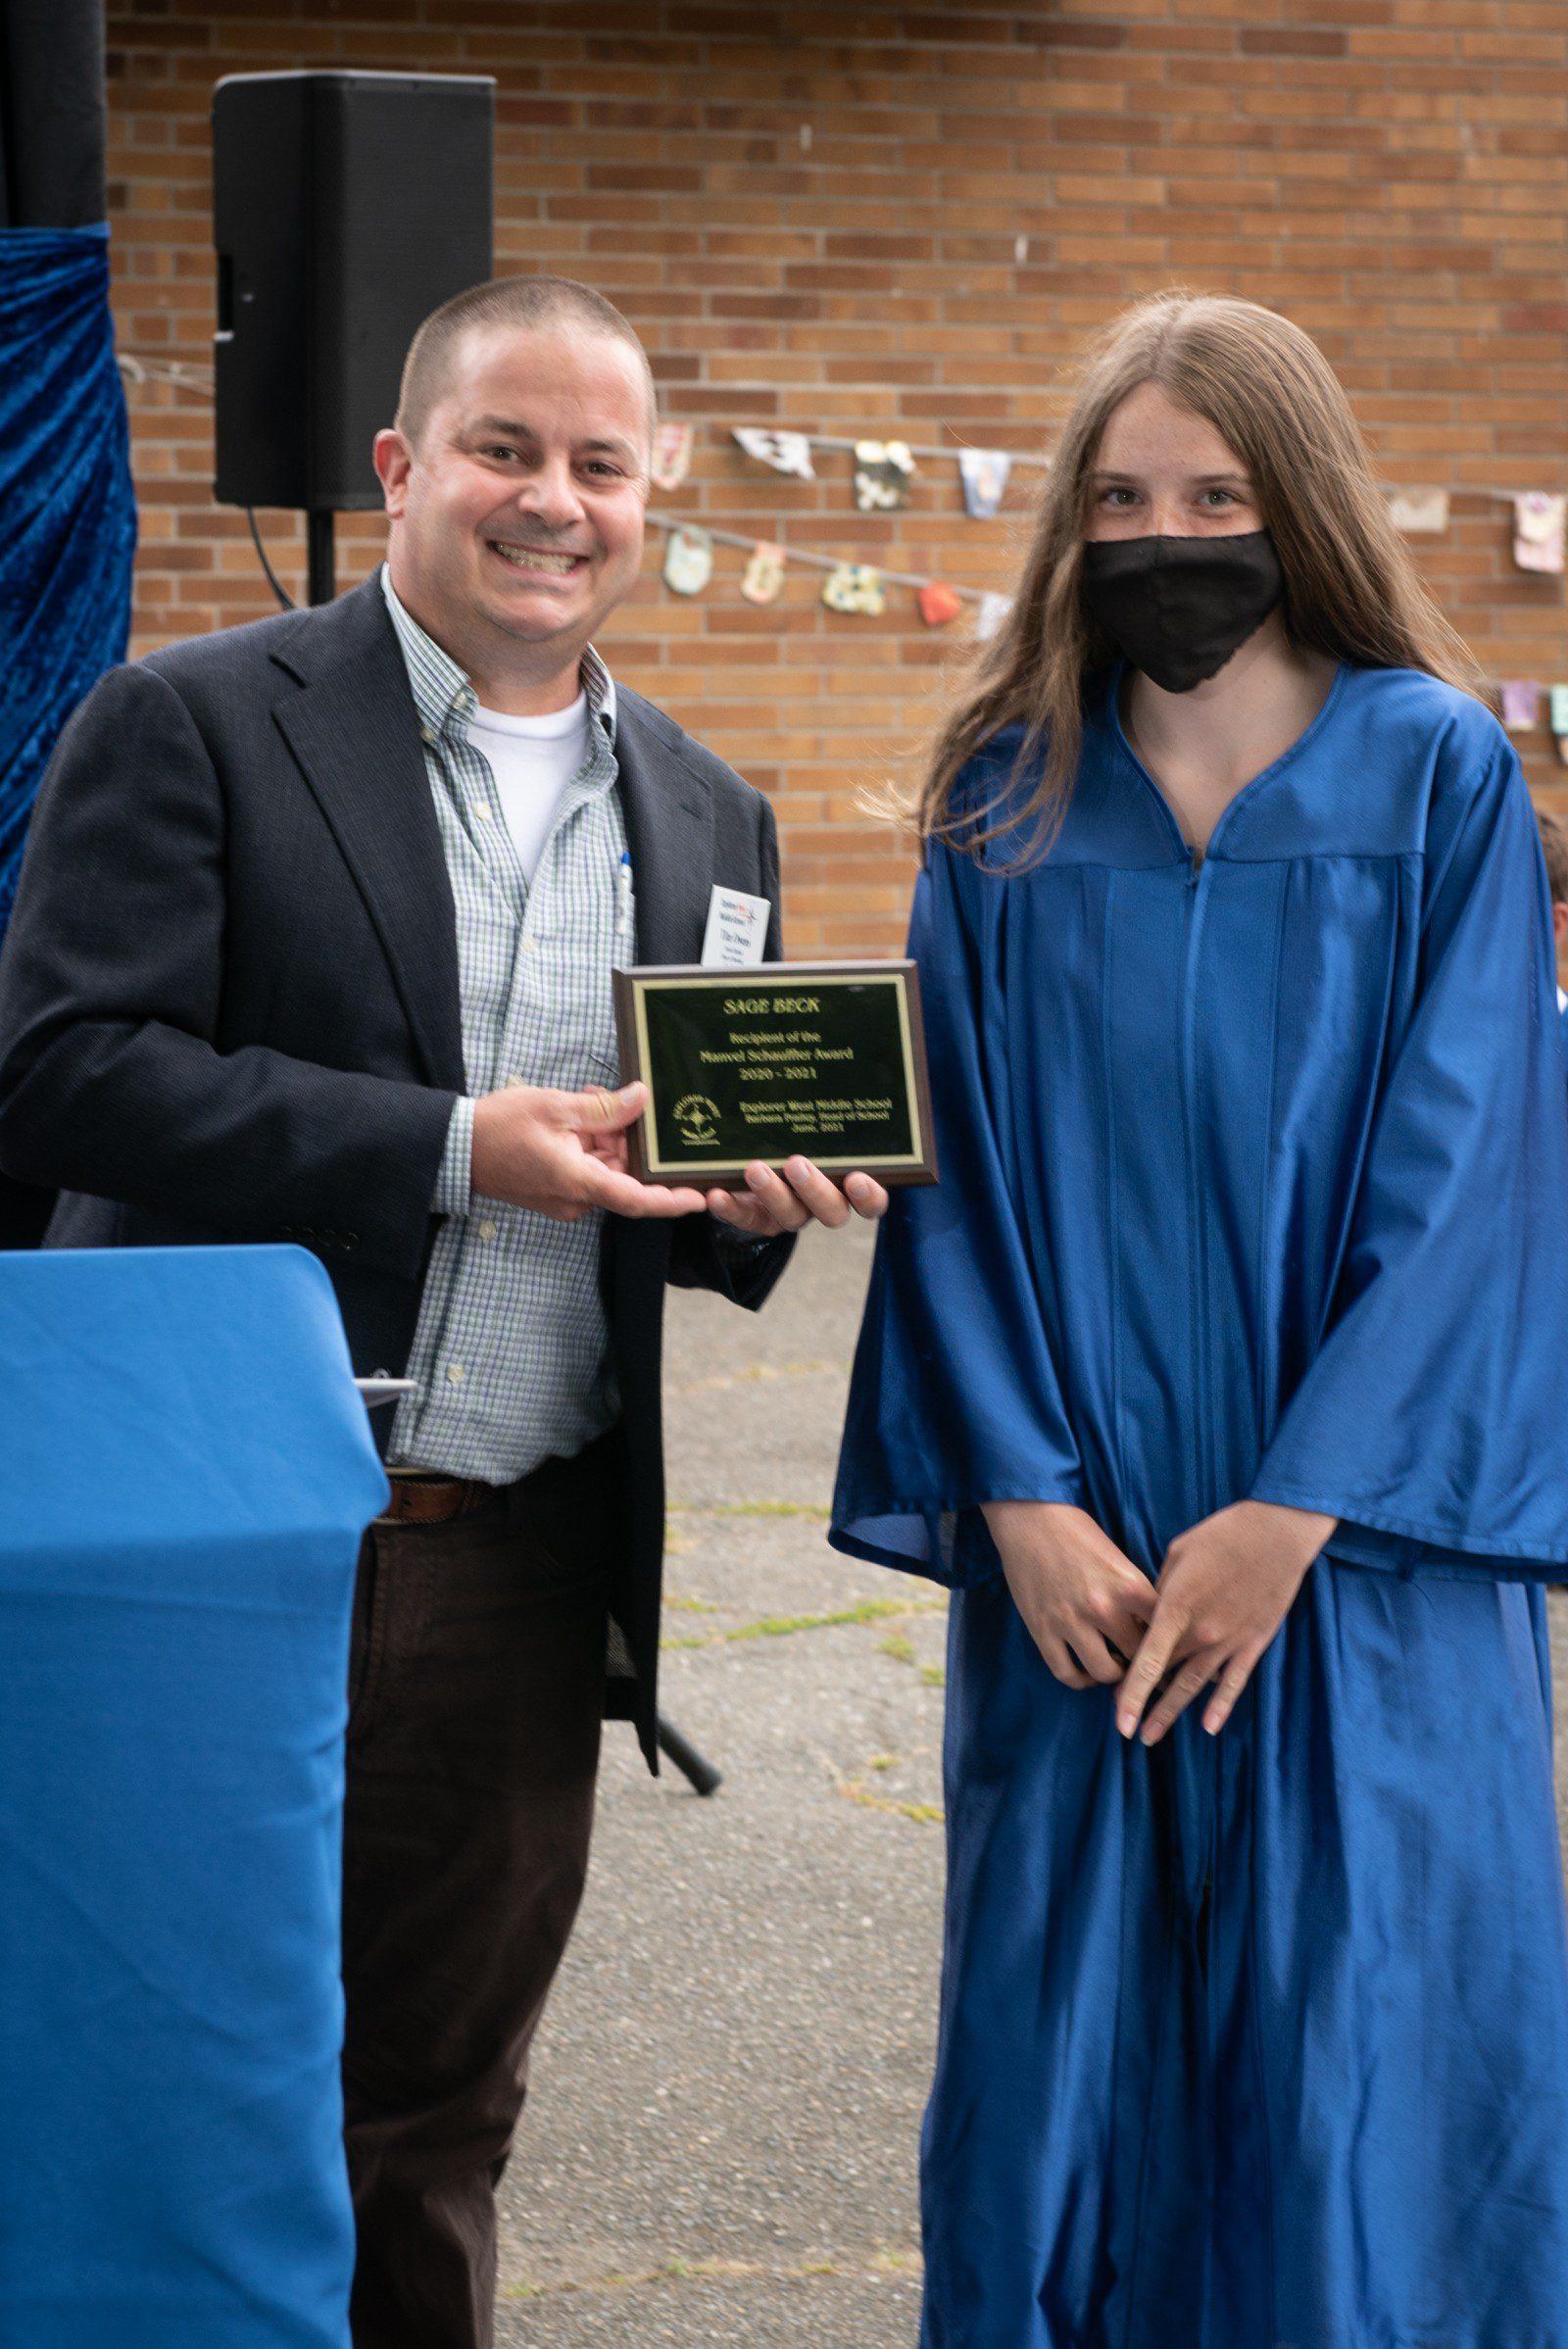 Tim Owens, Dean of Students, presents the Schauff Award